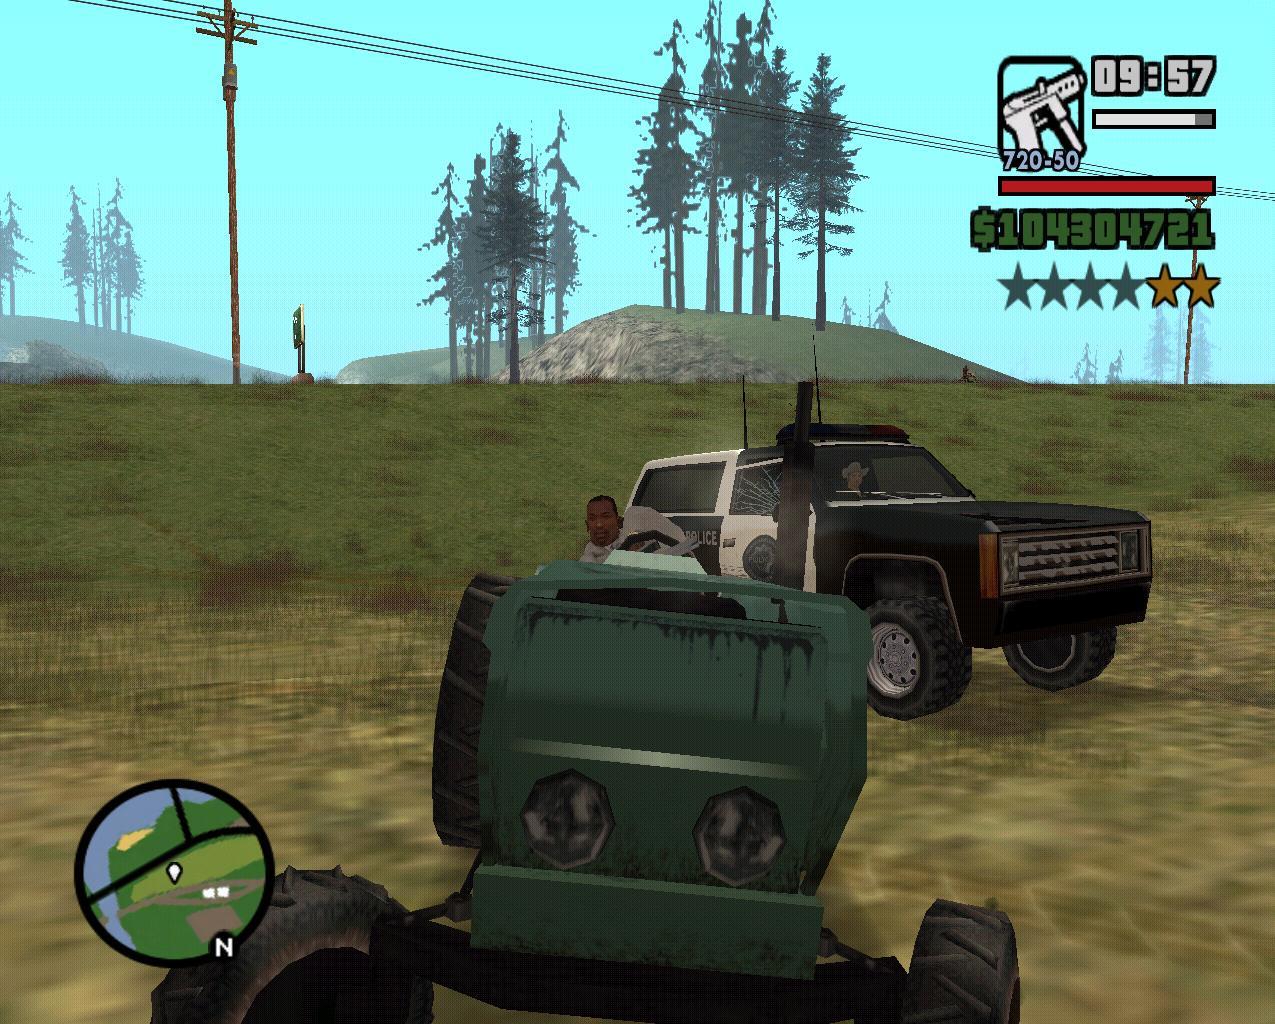 Grand Theft Auto: San Andreas review   GamesRadar+